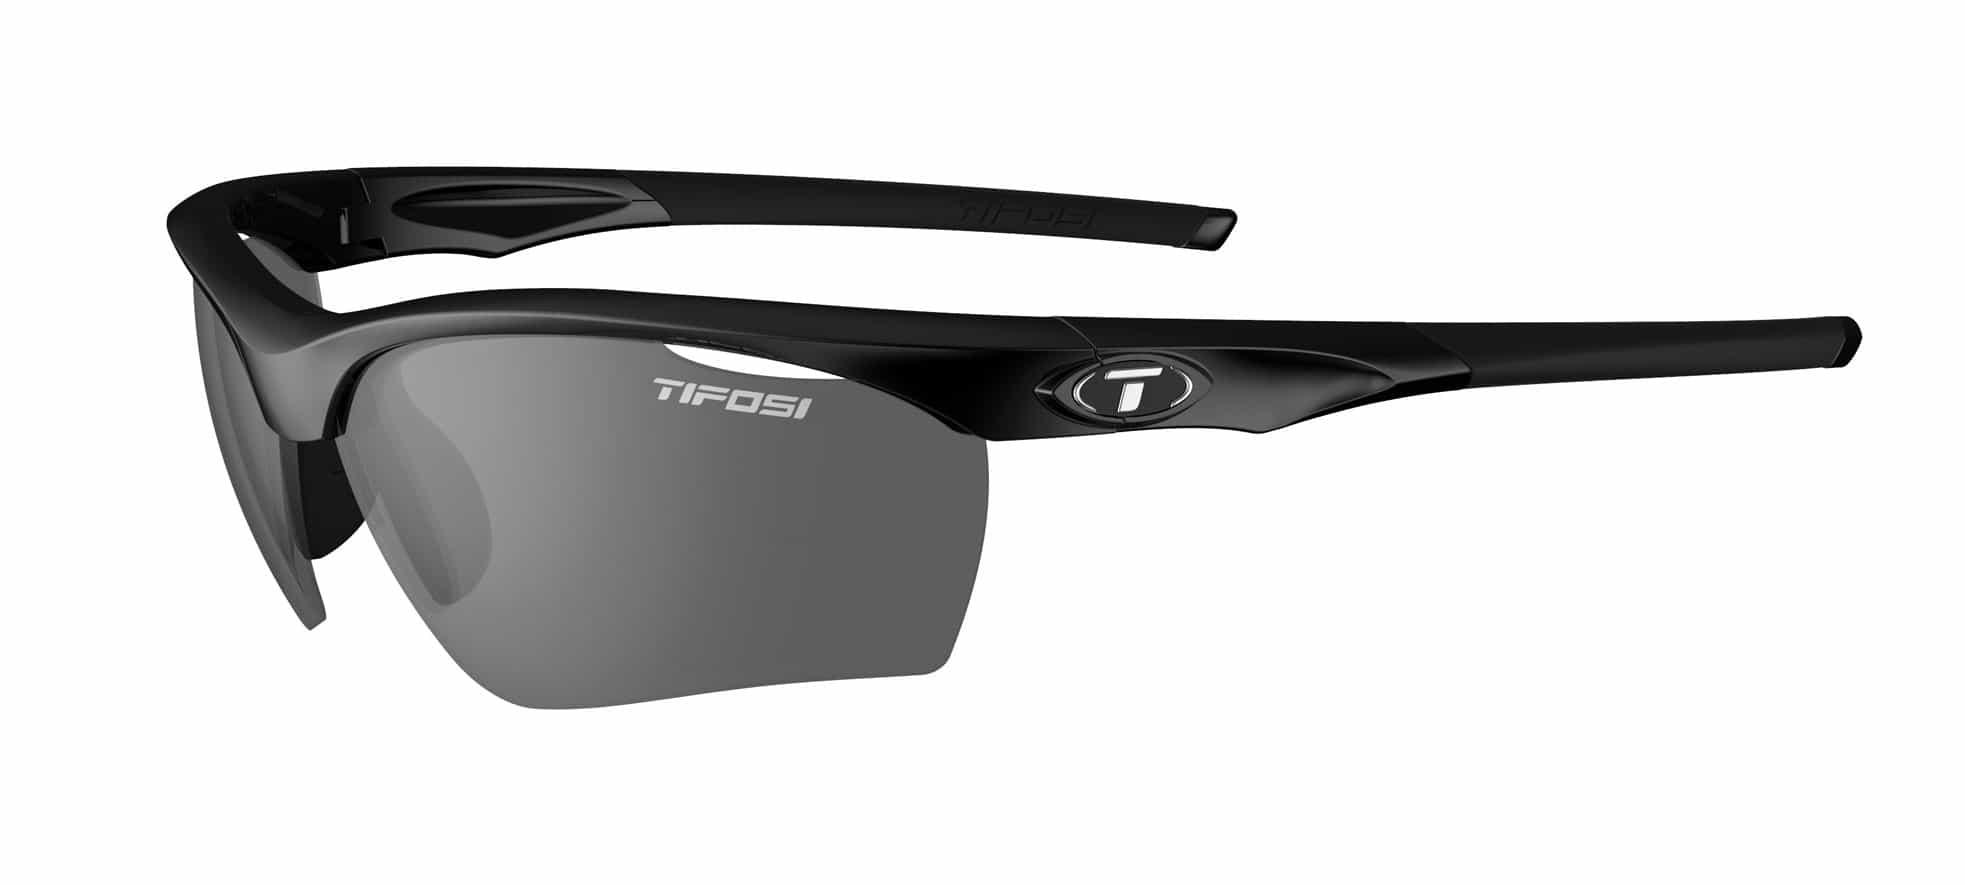 Tifosi Vero Sunglasses Gloss Black w/ Smoke Polarized